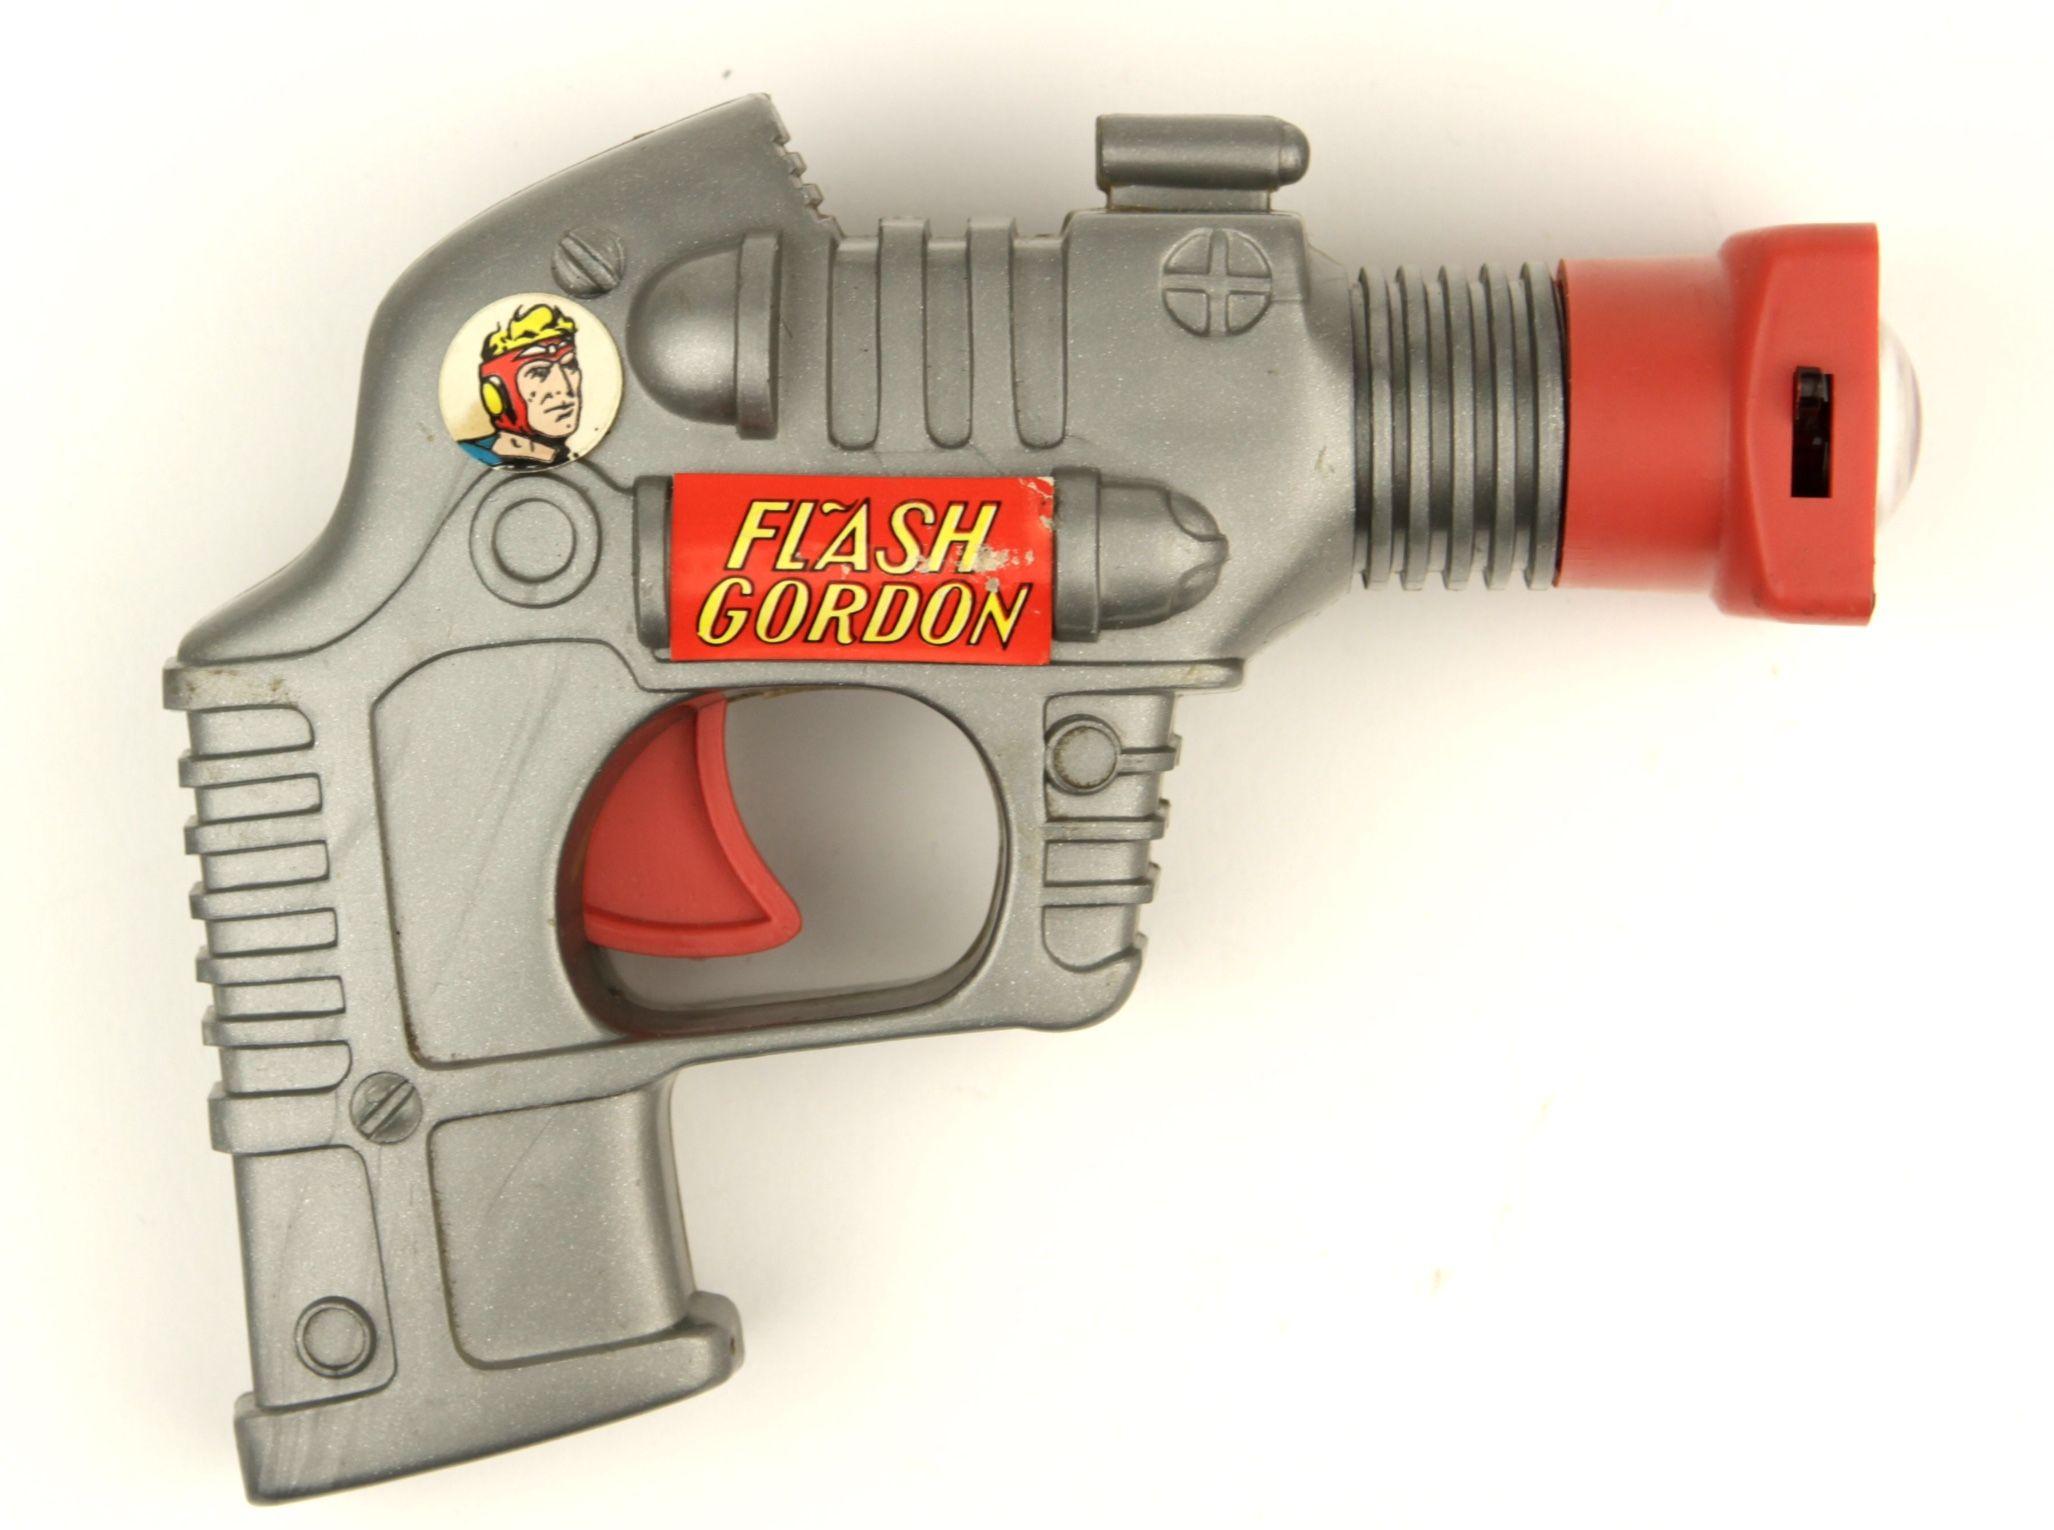 Flash Gordon toy ray gun